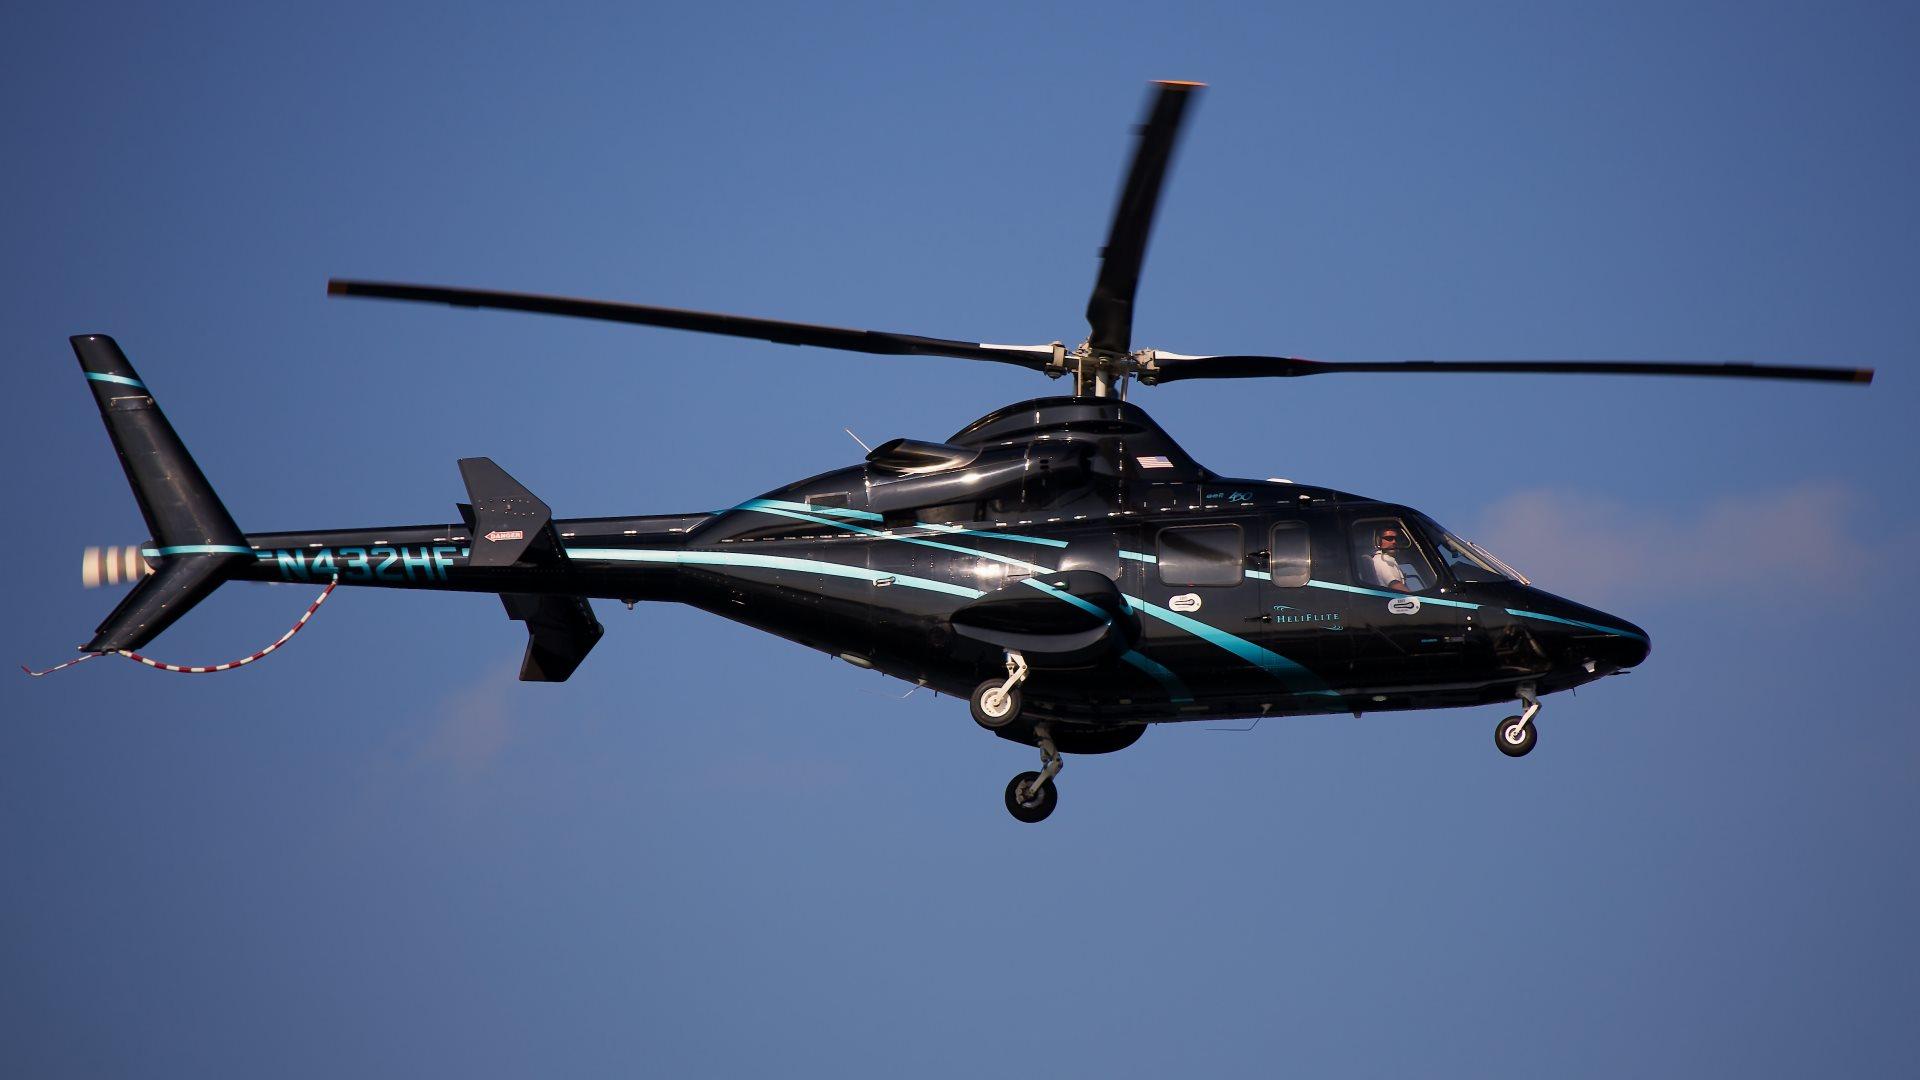 Bell430HelicopterN432HFHDwallpaper1080pjpg 1920x1080